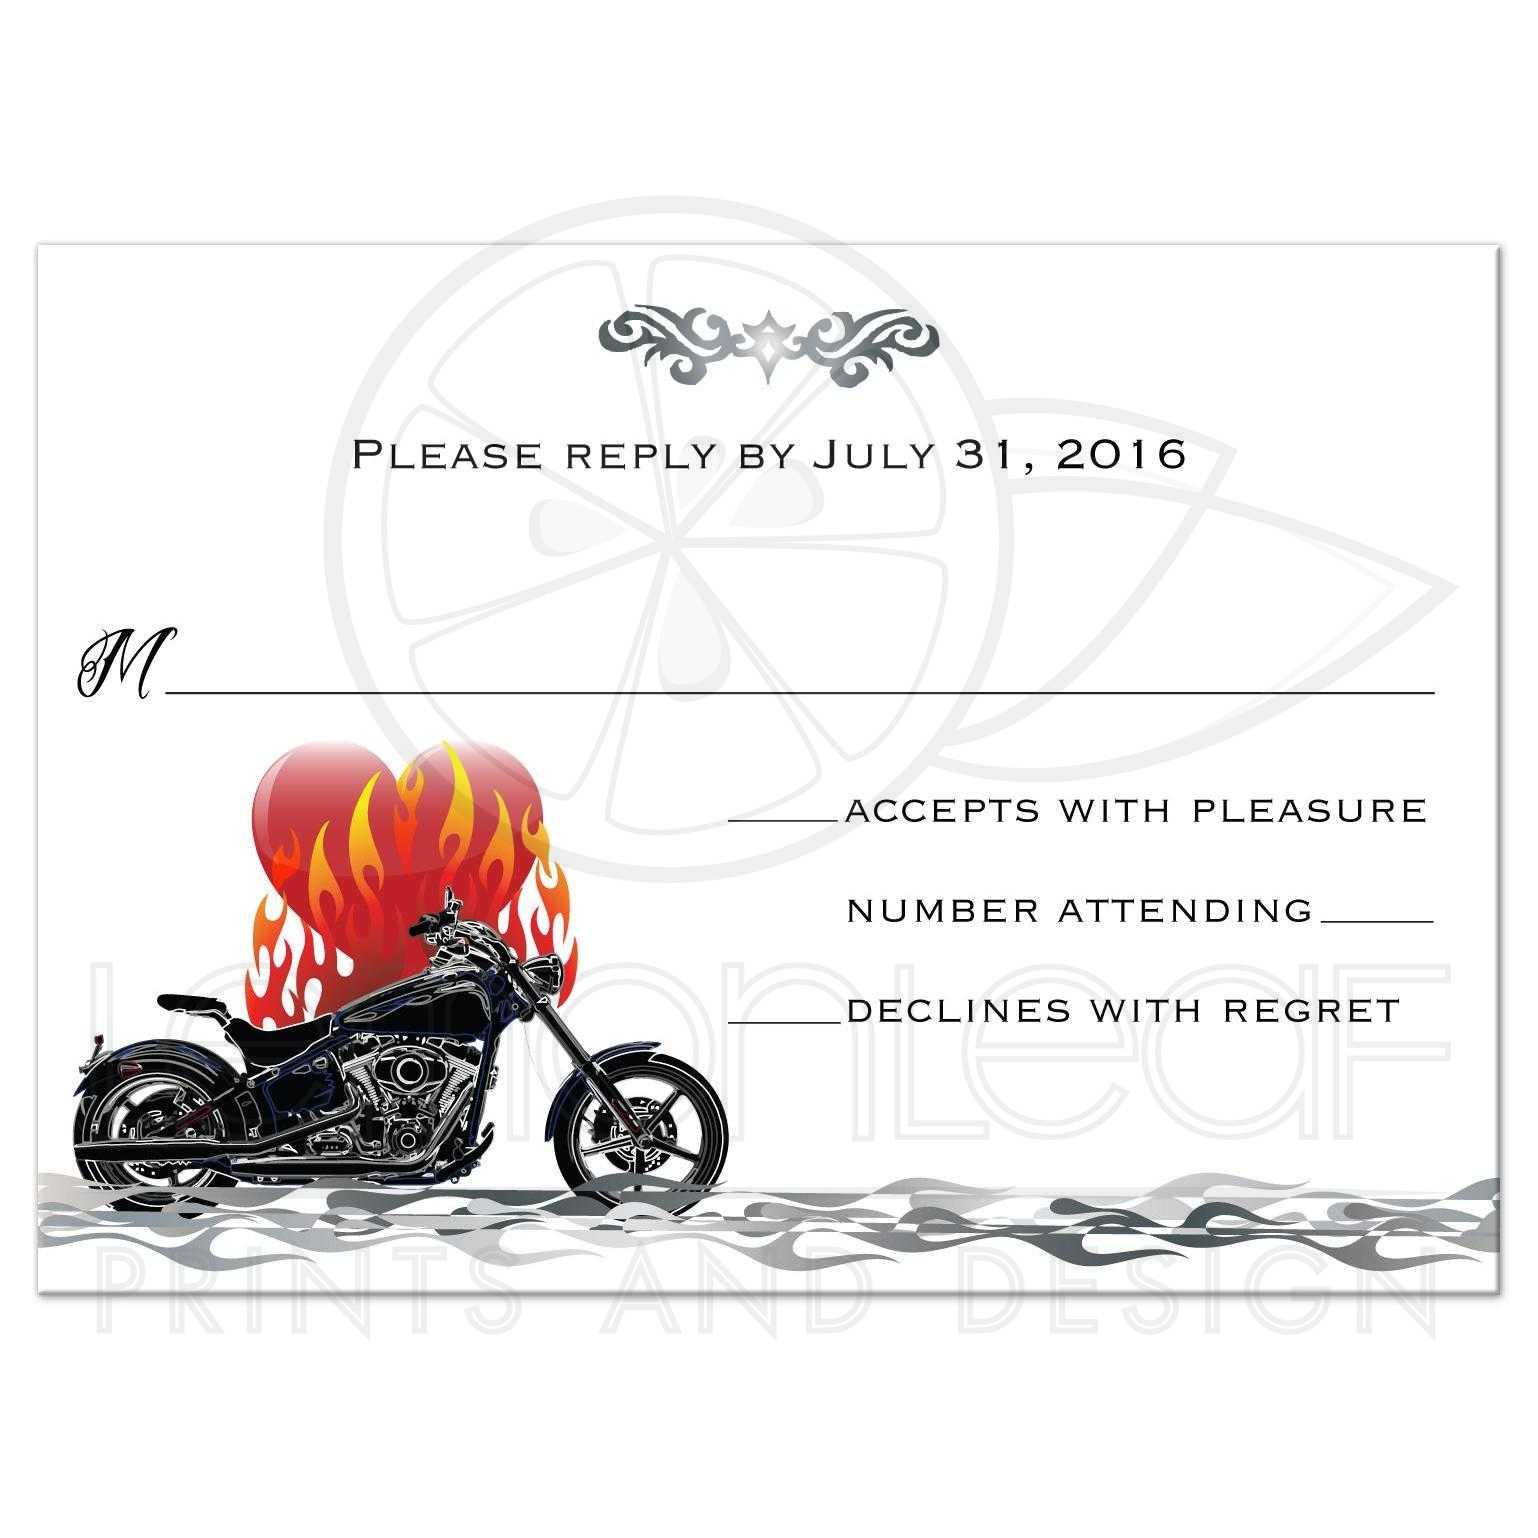 Wedding RSVP Reply Card - Grunge Beams Motorcycle Biker Burning Love